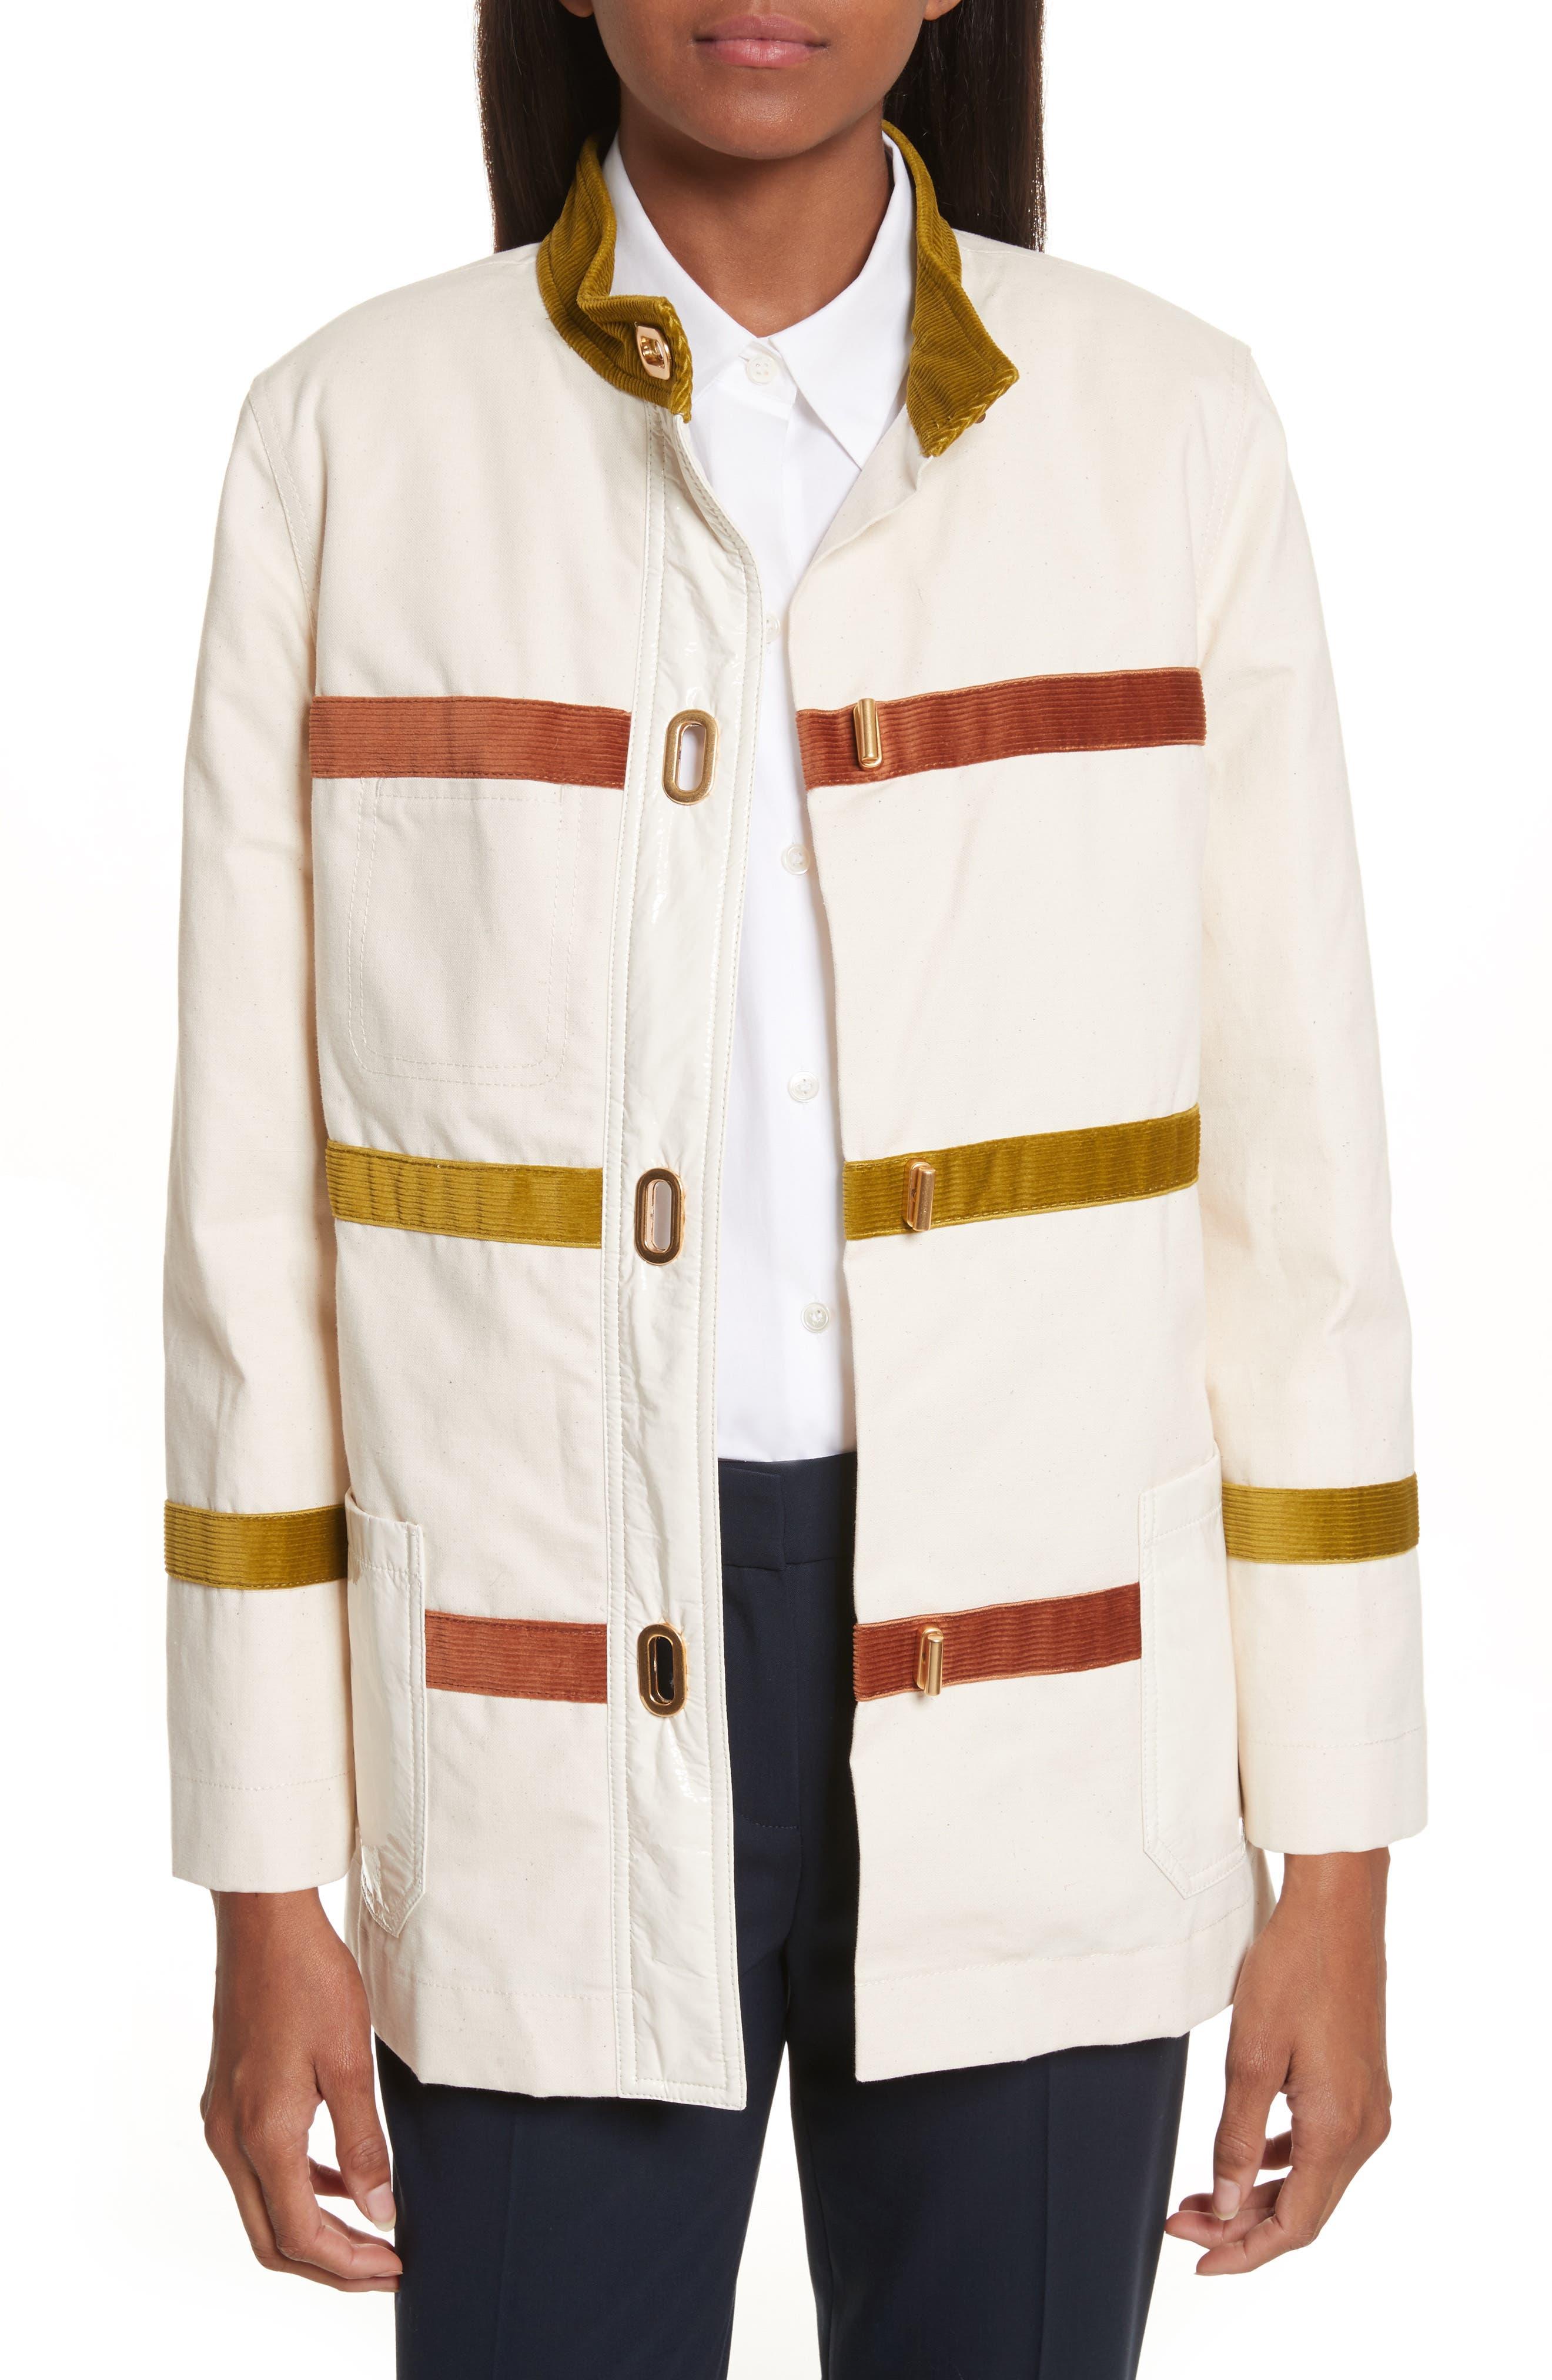 Alternate Image 1 Selected - Tory Burch Cadyn Jacket